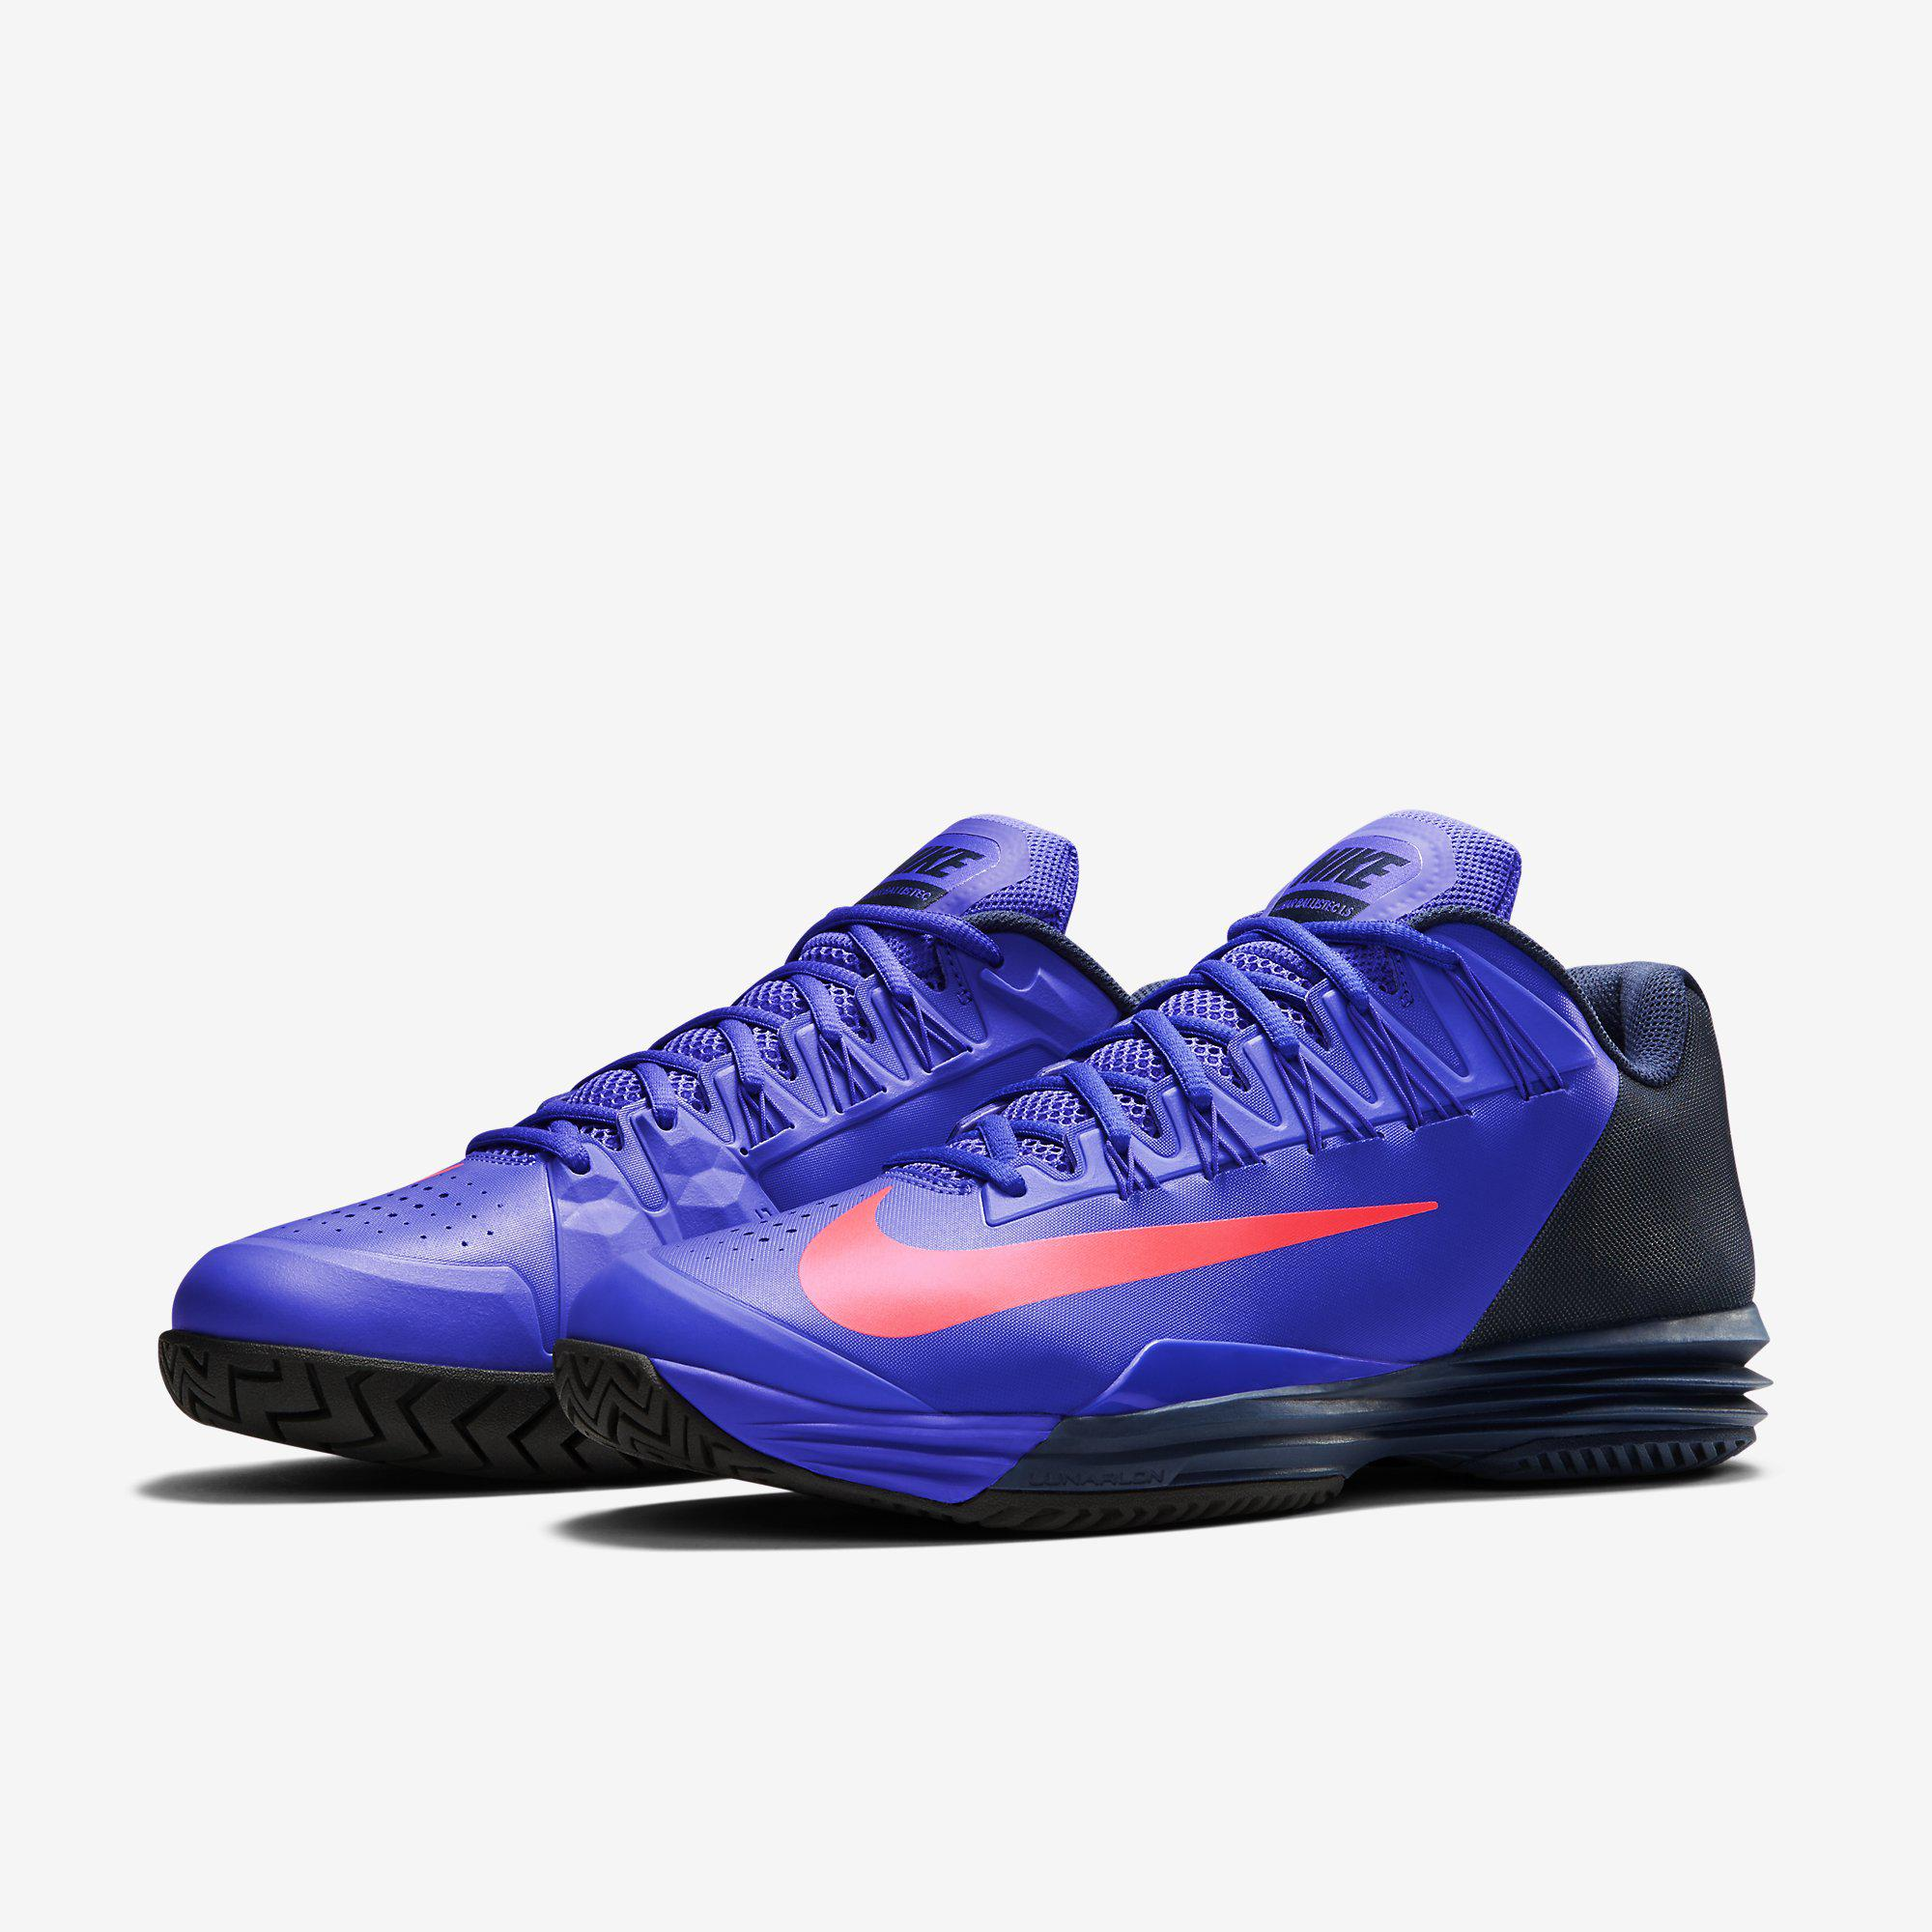 5c0fab70423c Nike Mens Lunar Ballistec 1.5 Tennis Shoes - Persian Violet Midnight Navy  ...